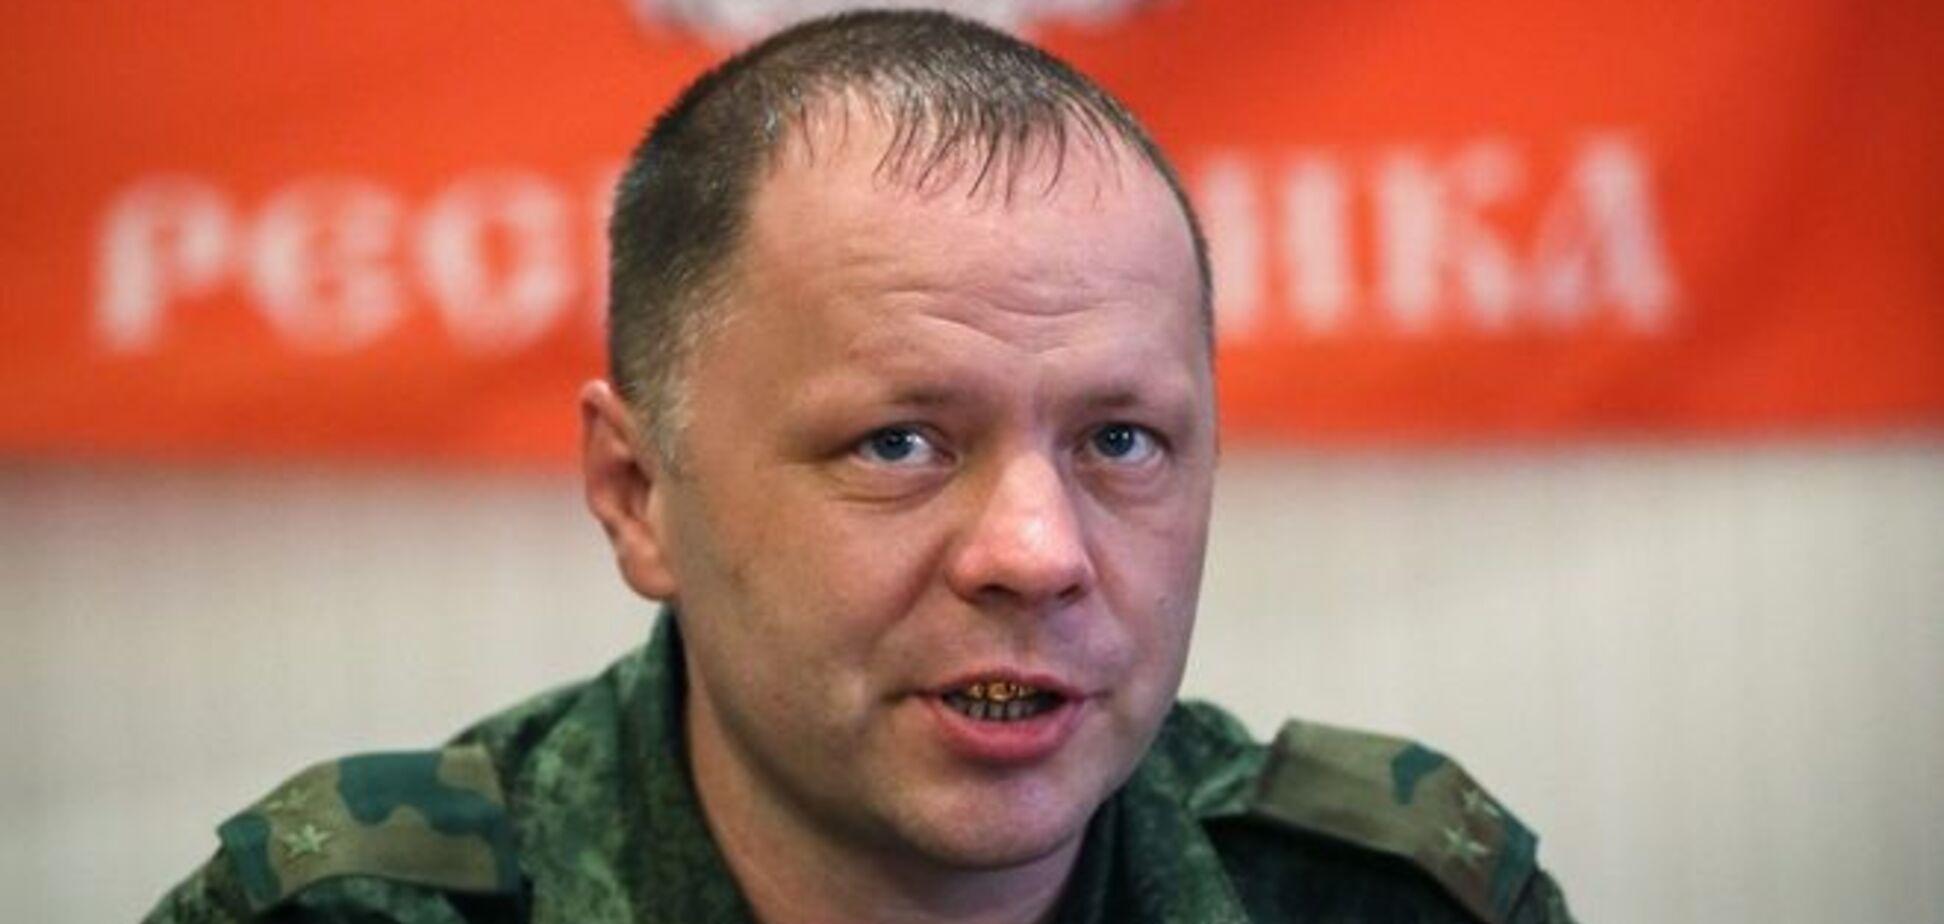 Террористы заявили об обстреле кортежа 'министра ДНР'